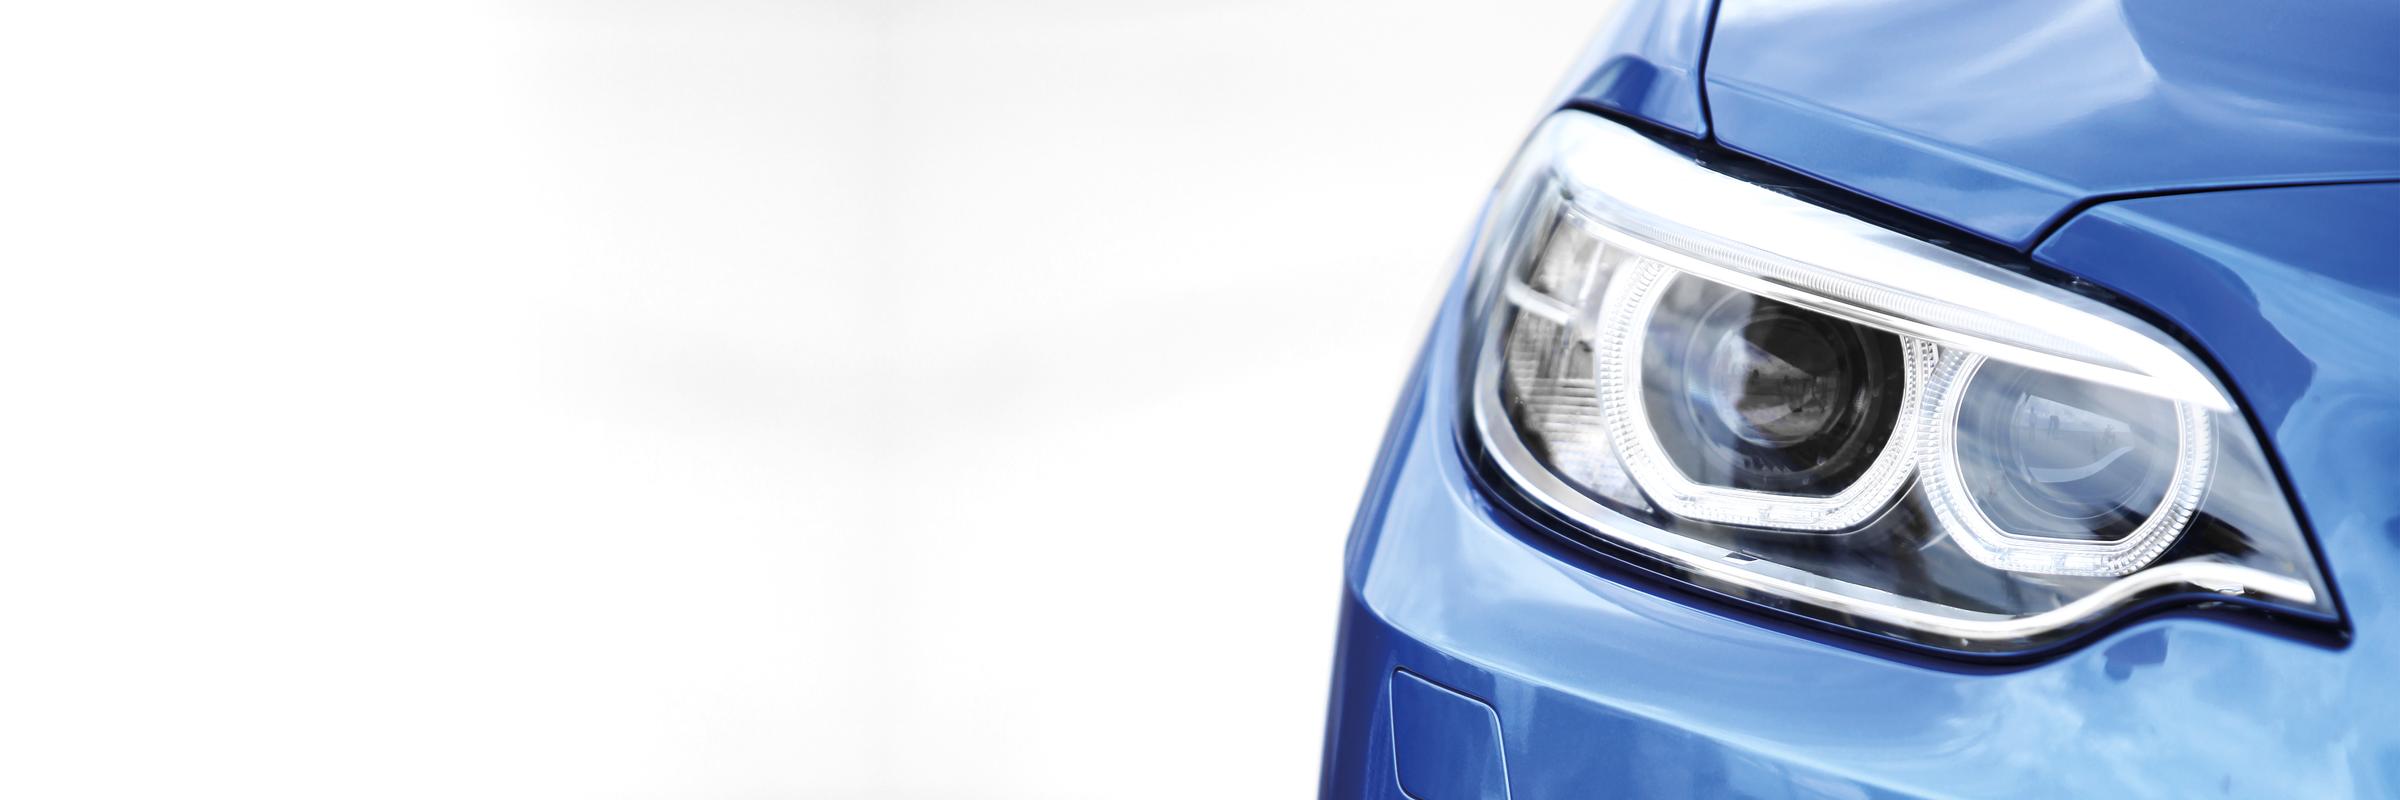 Automobile - LED Lighting